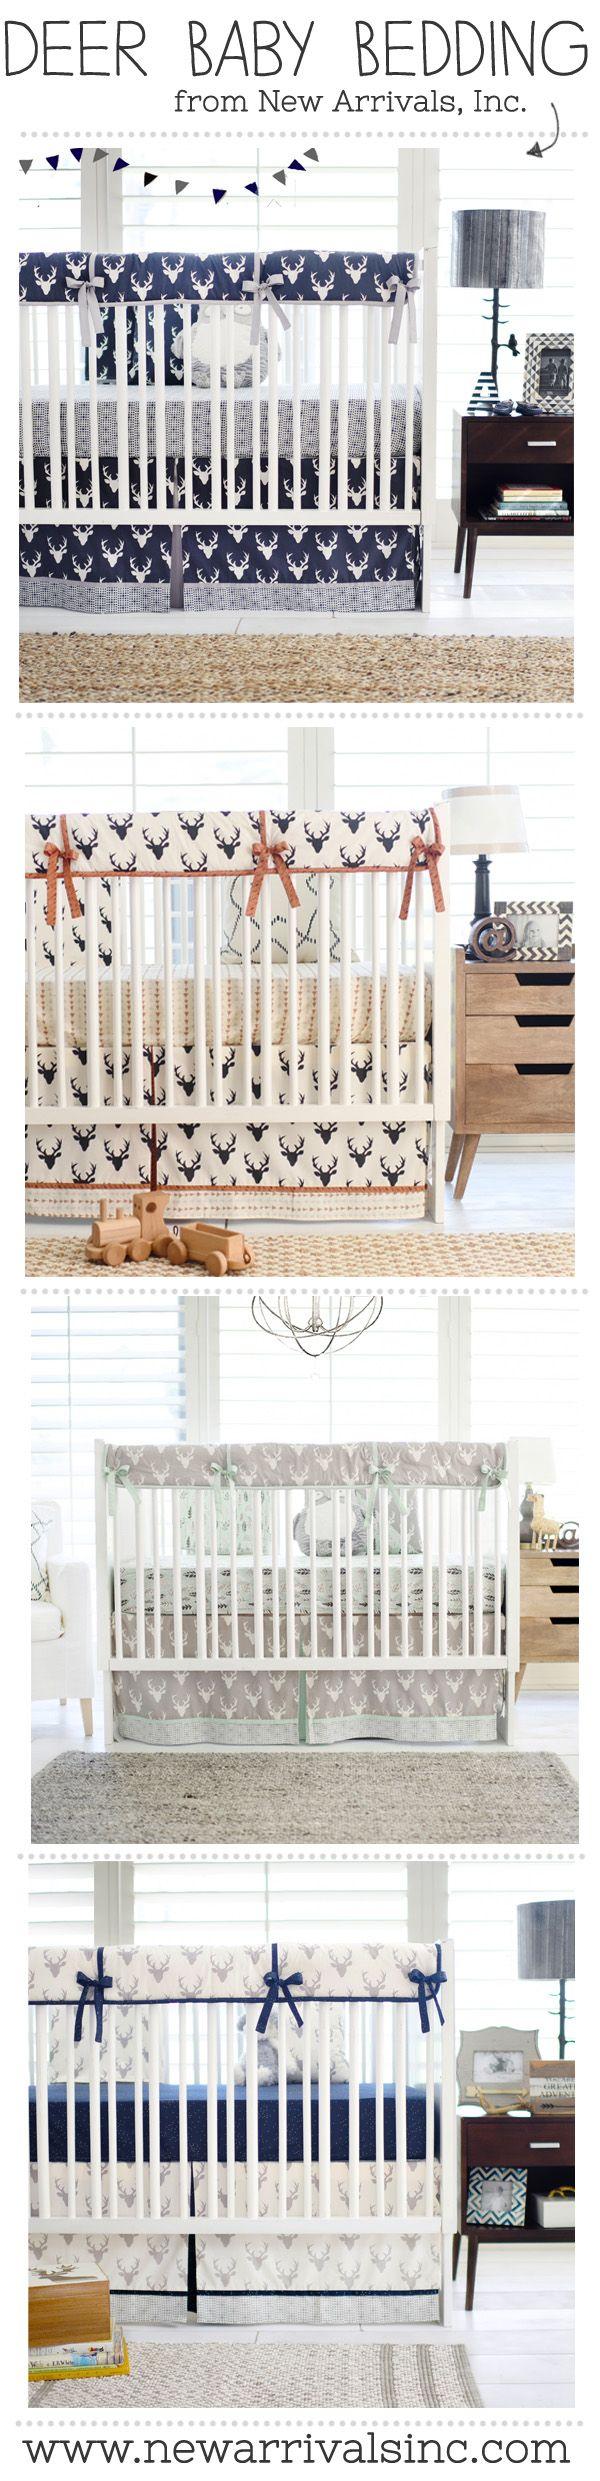 Best Deer Nursery Bedding Ideas On Pinterest Boy Nursery - Baby boy deer crib bedding sets